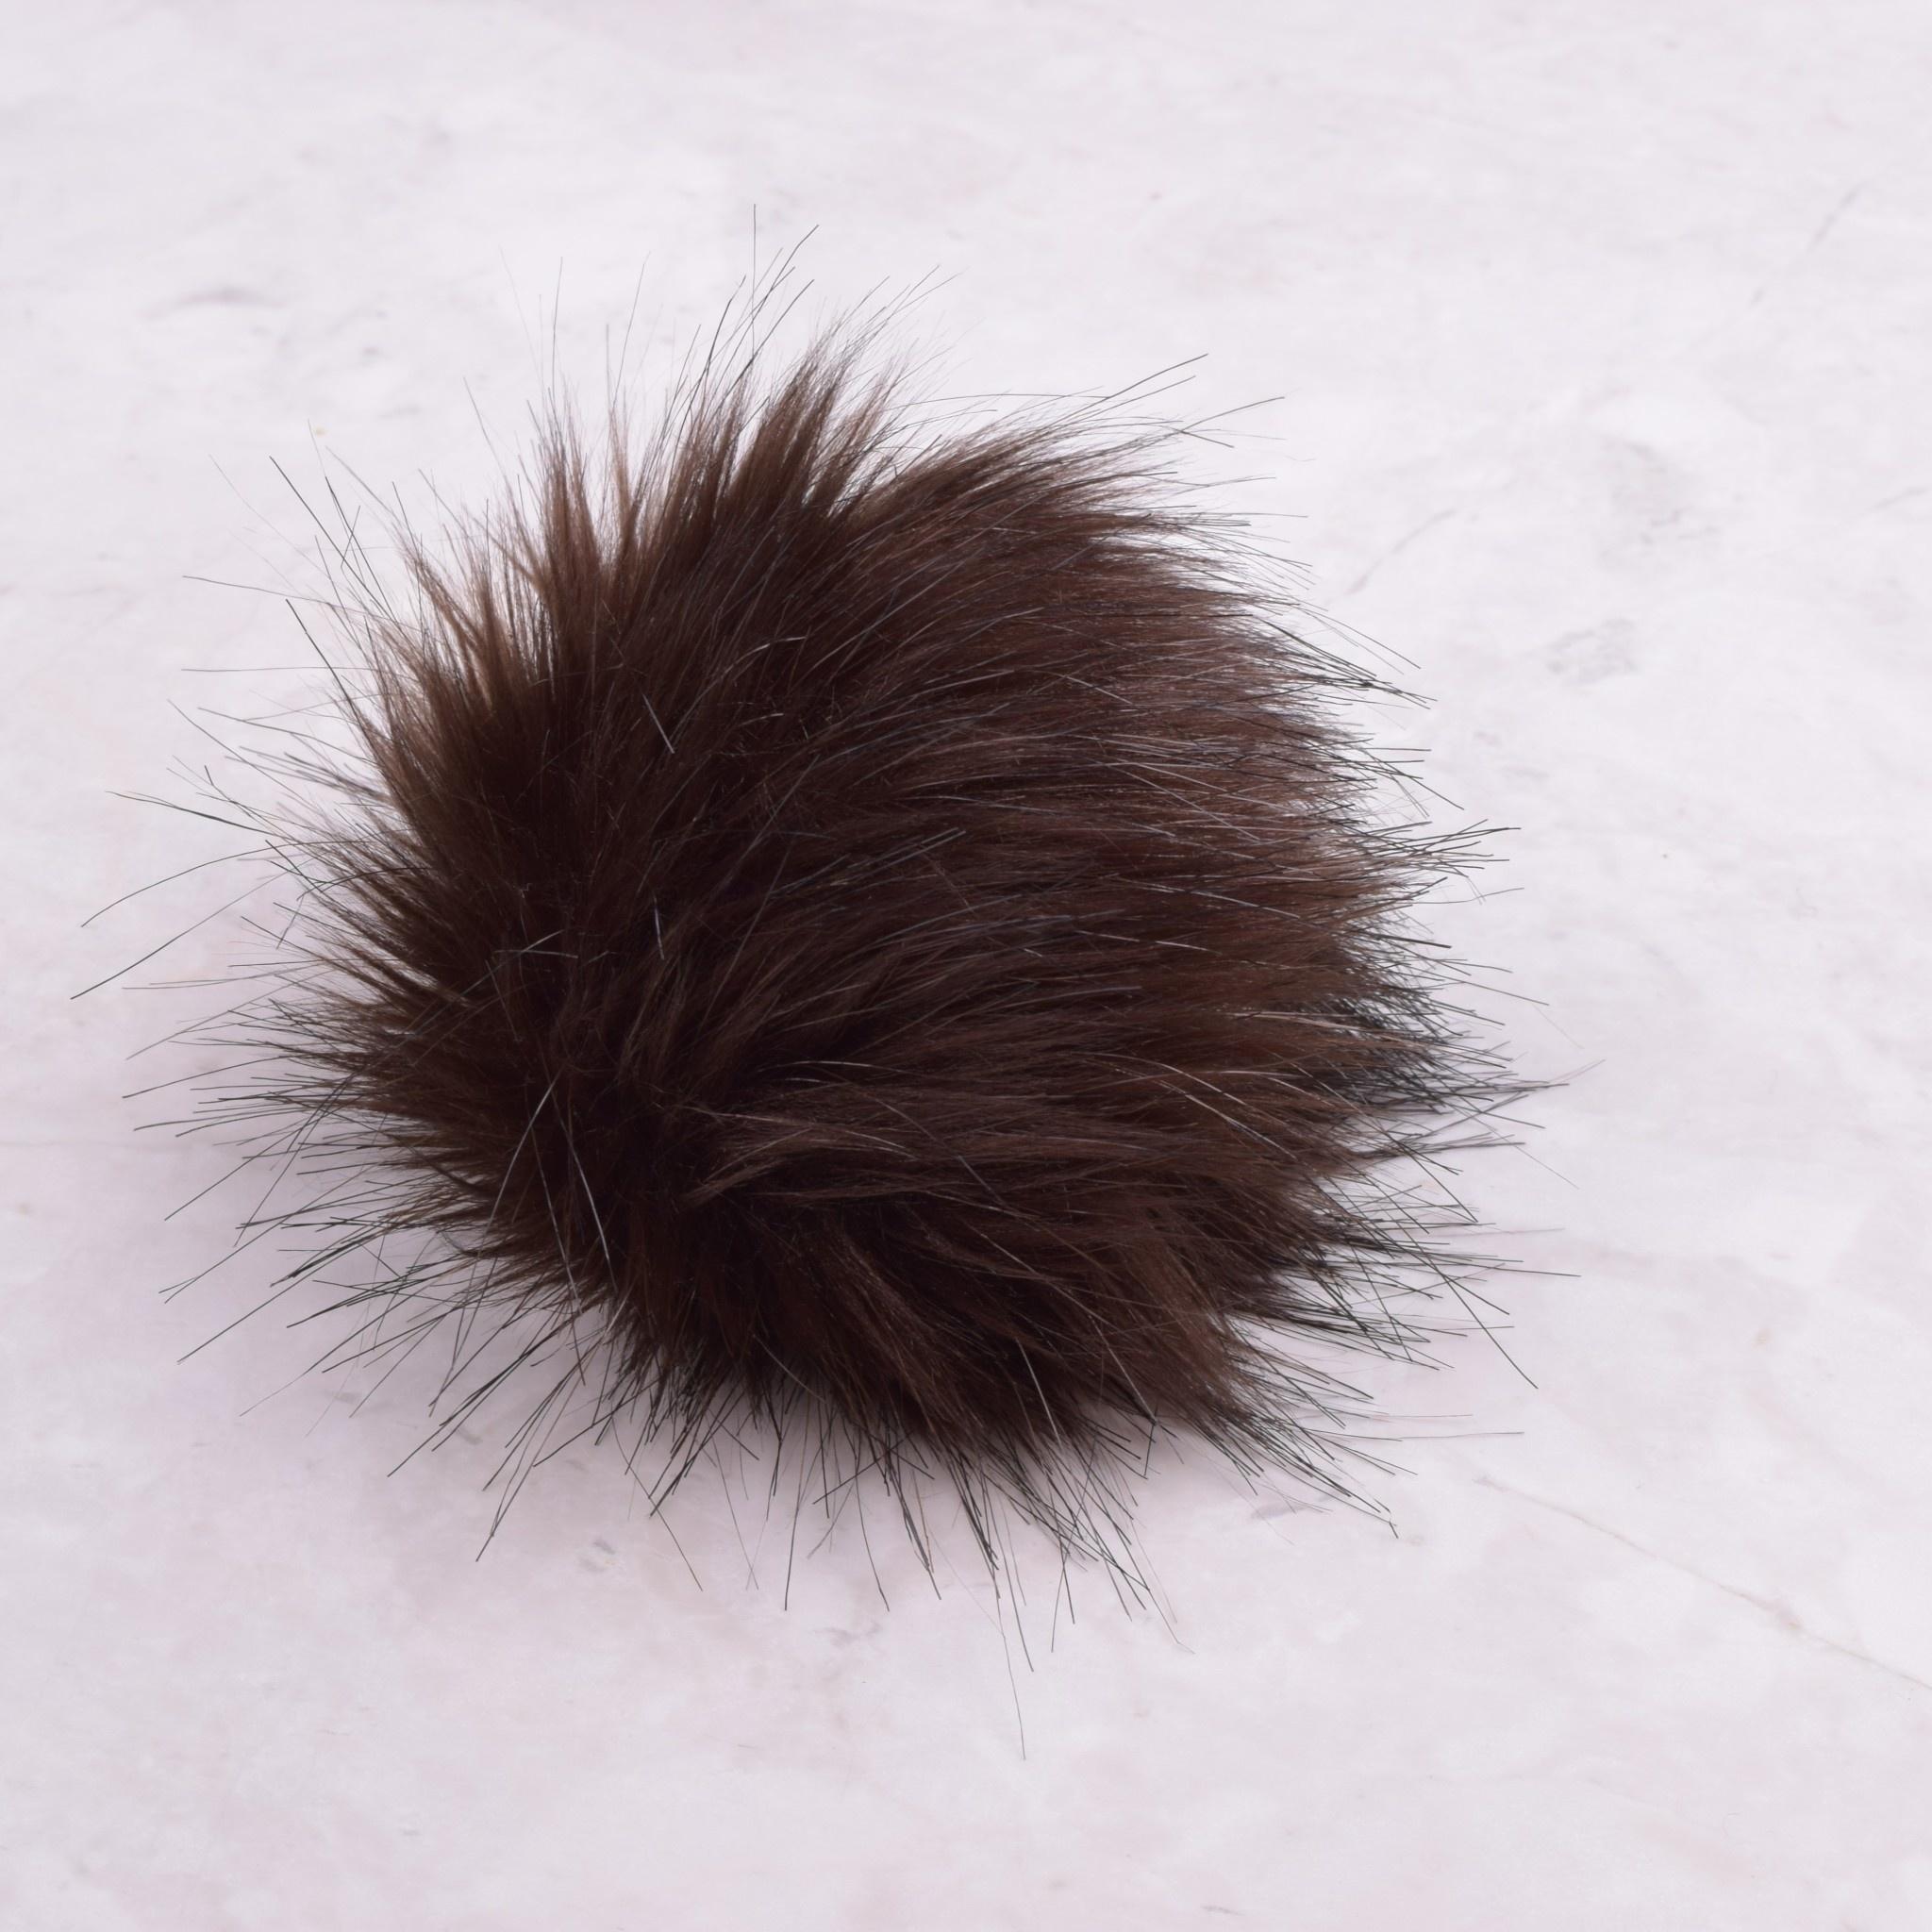 Image of Faux Fur Pom Pom Brown Mink, Tie Closure